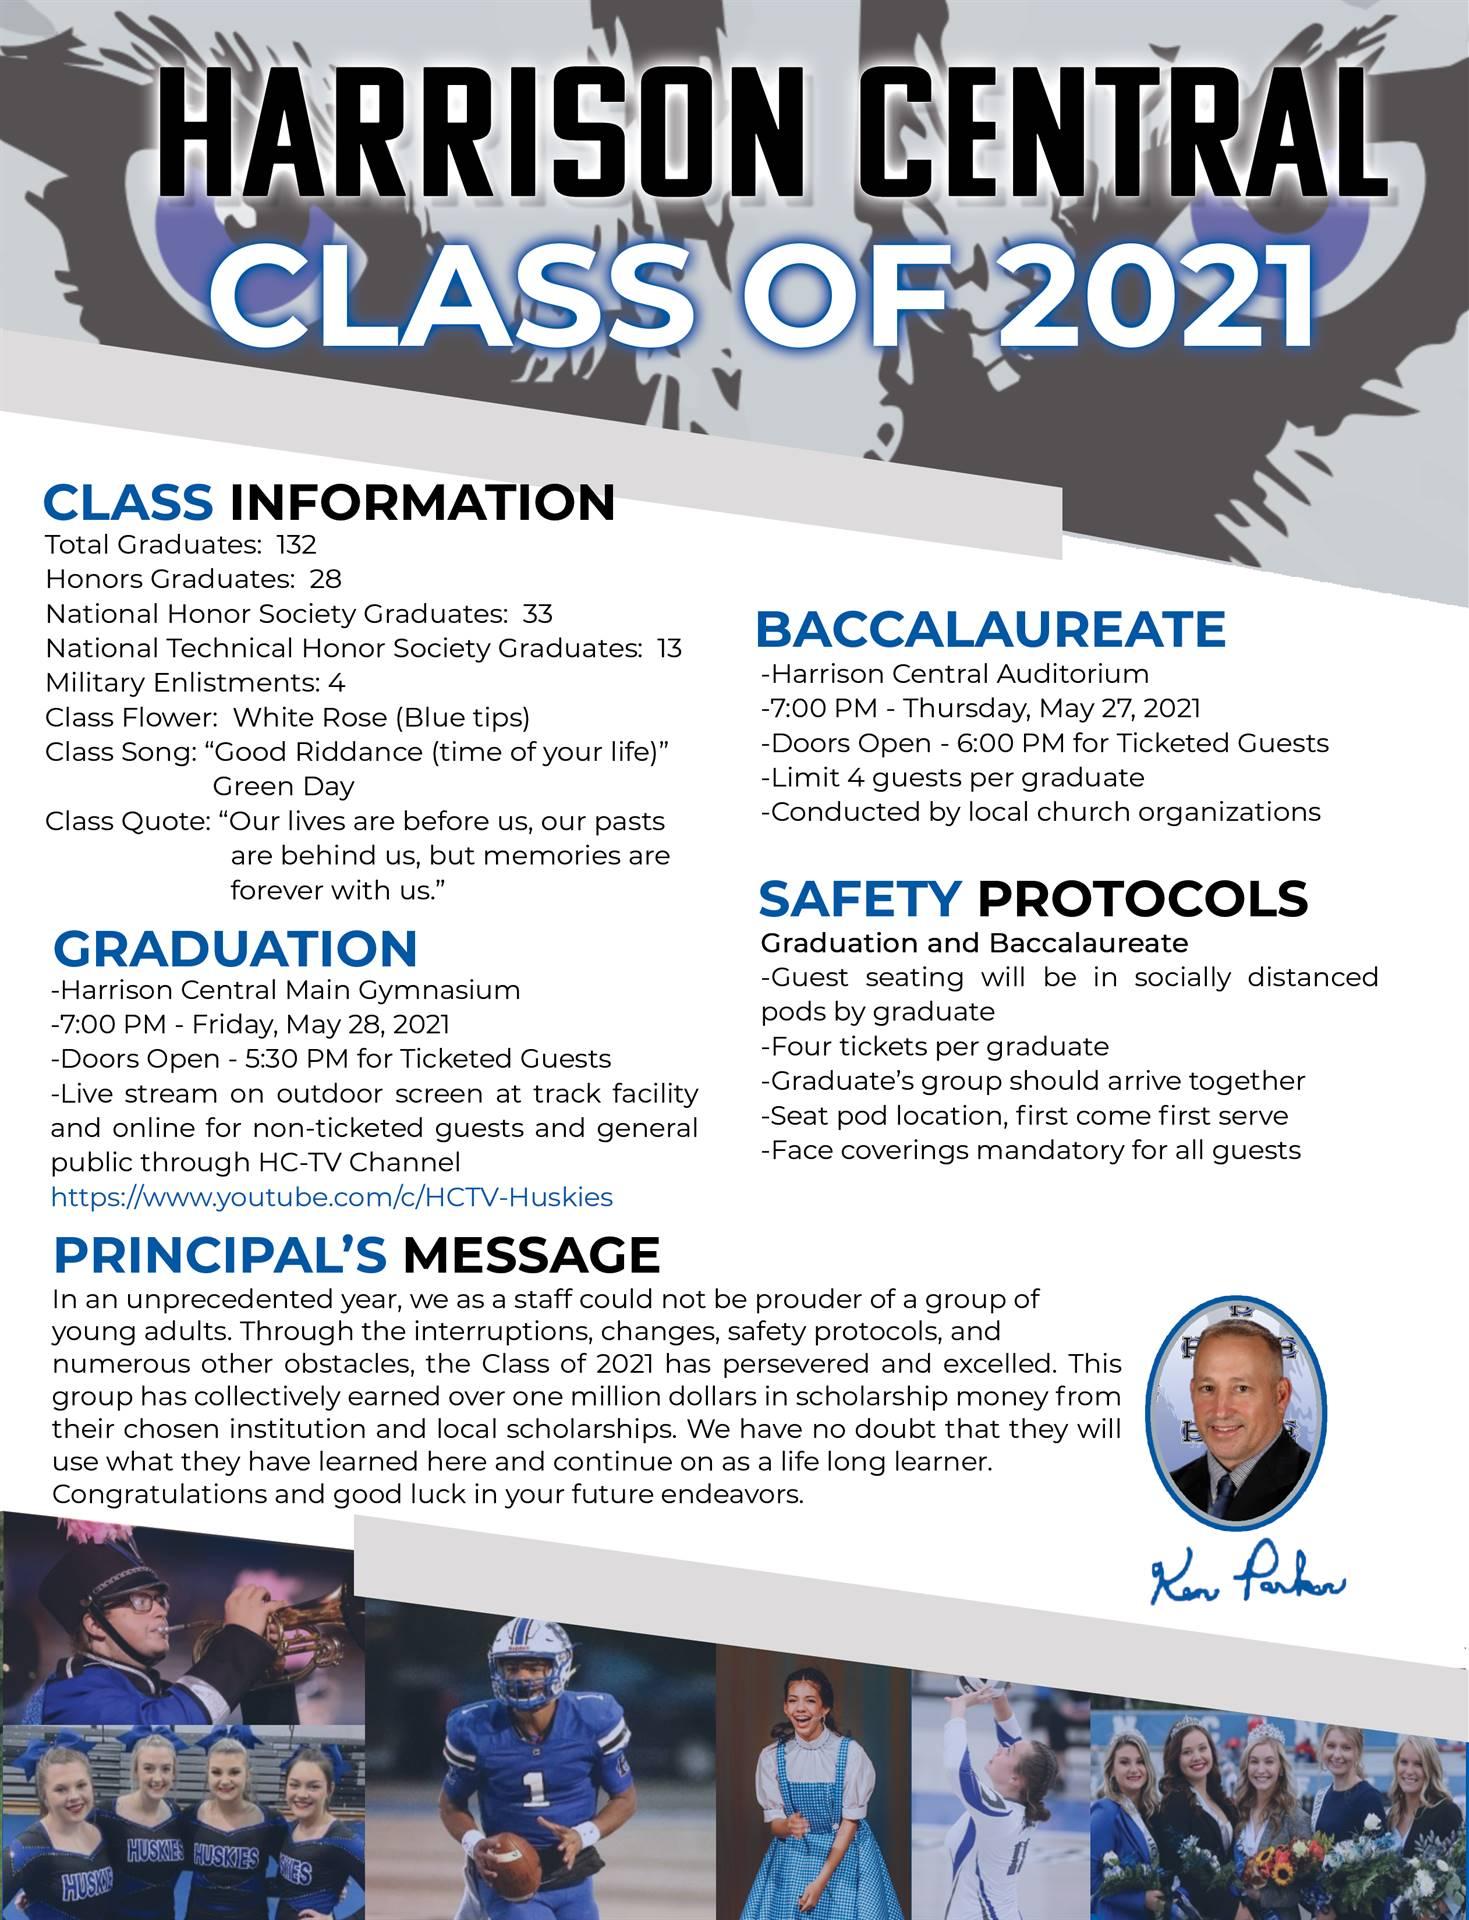 Class of 2021 Grad Information